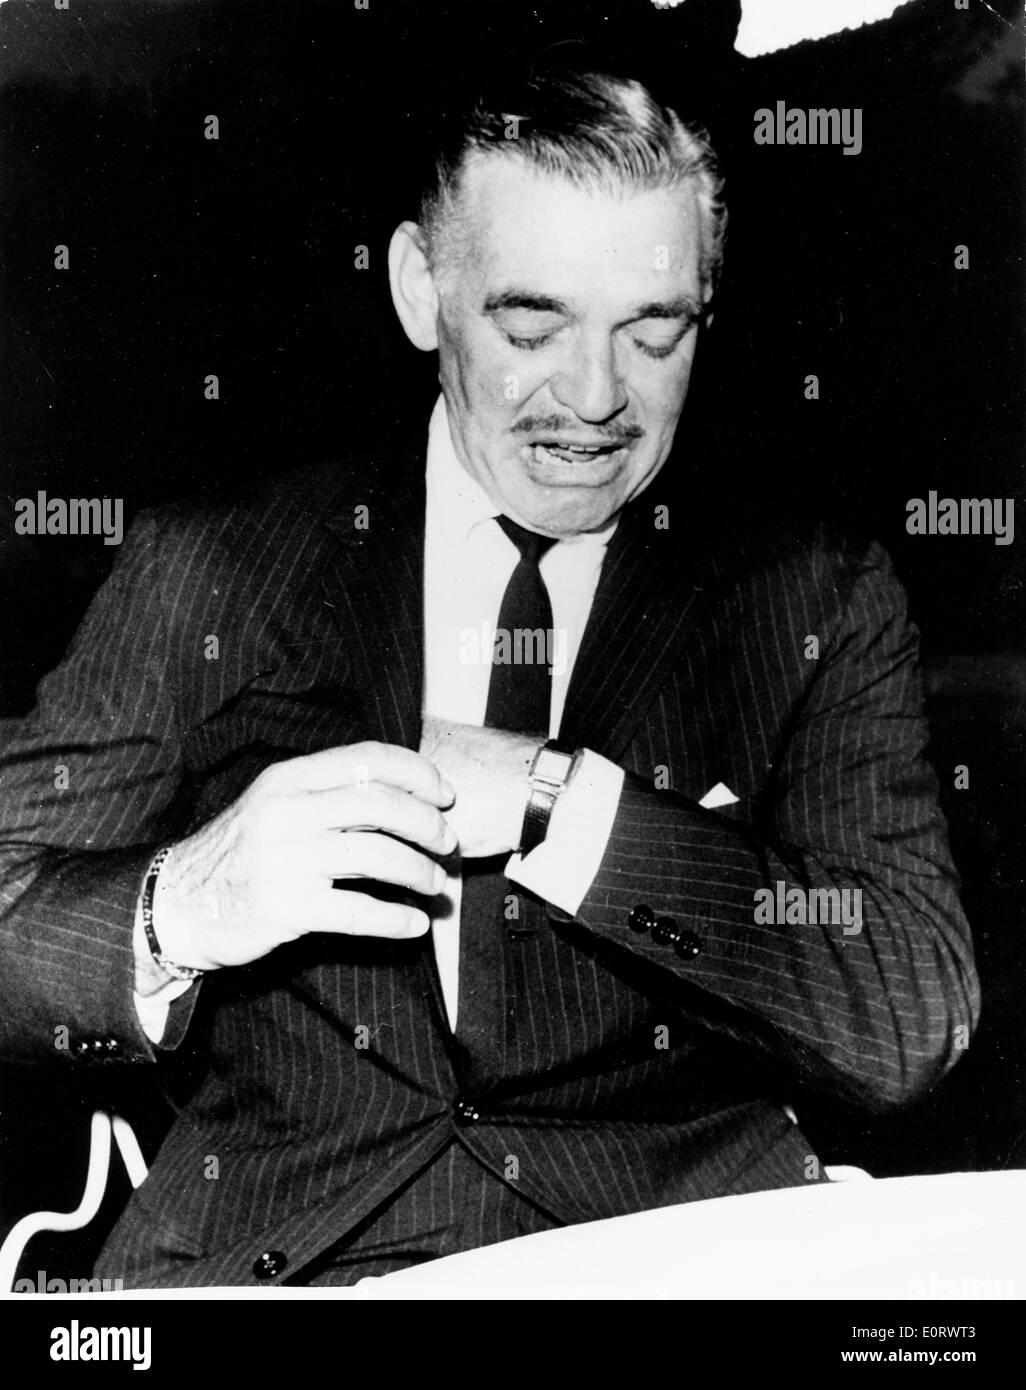 Actor Clark Gable adjusts his watch - Stock Image